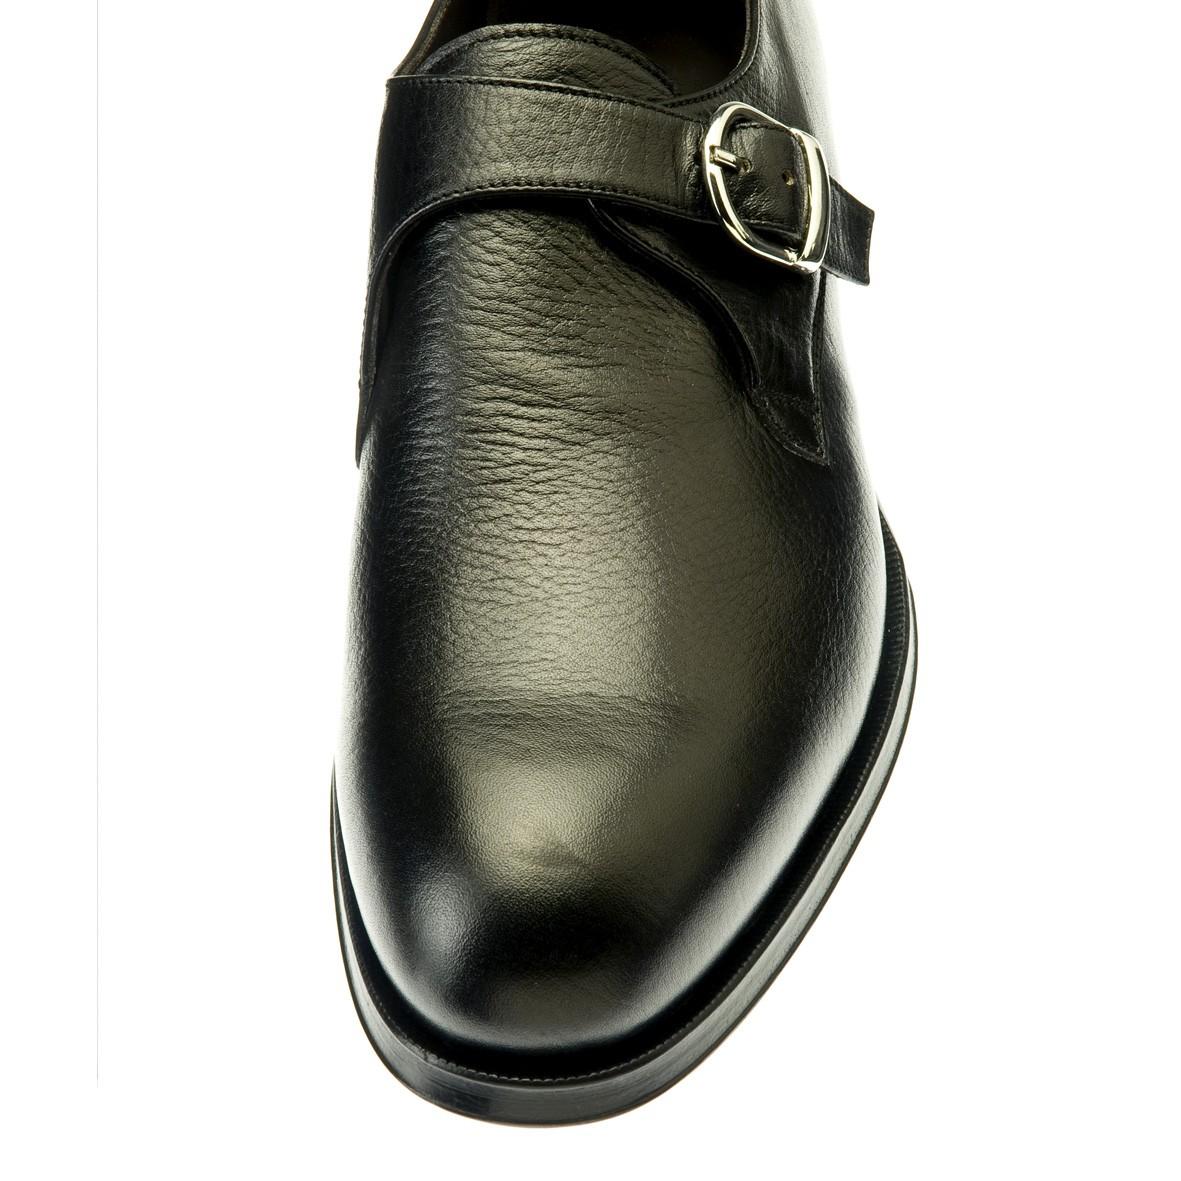 ee684d9b98e3 Rodolfo - Black Leather